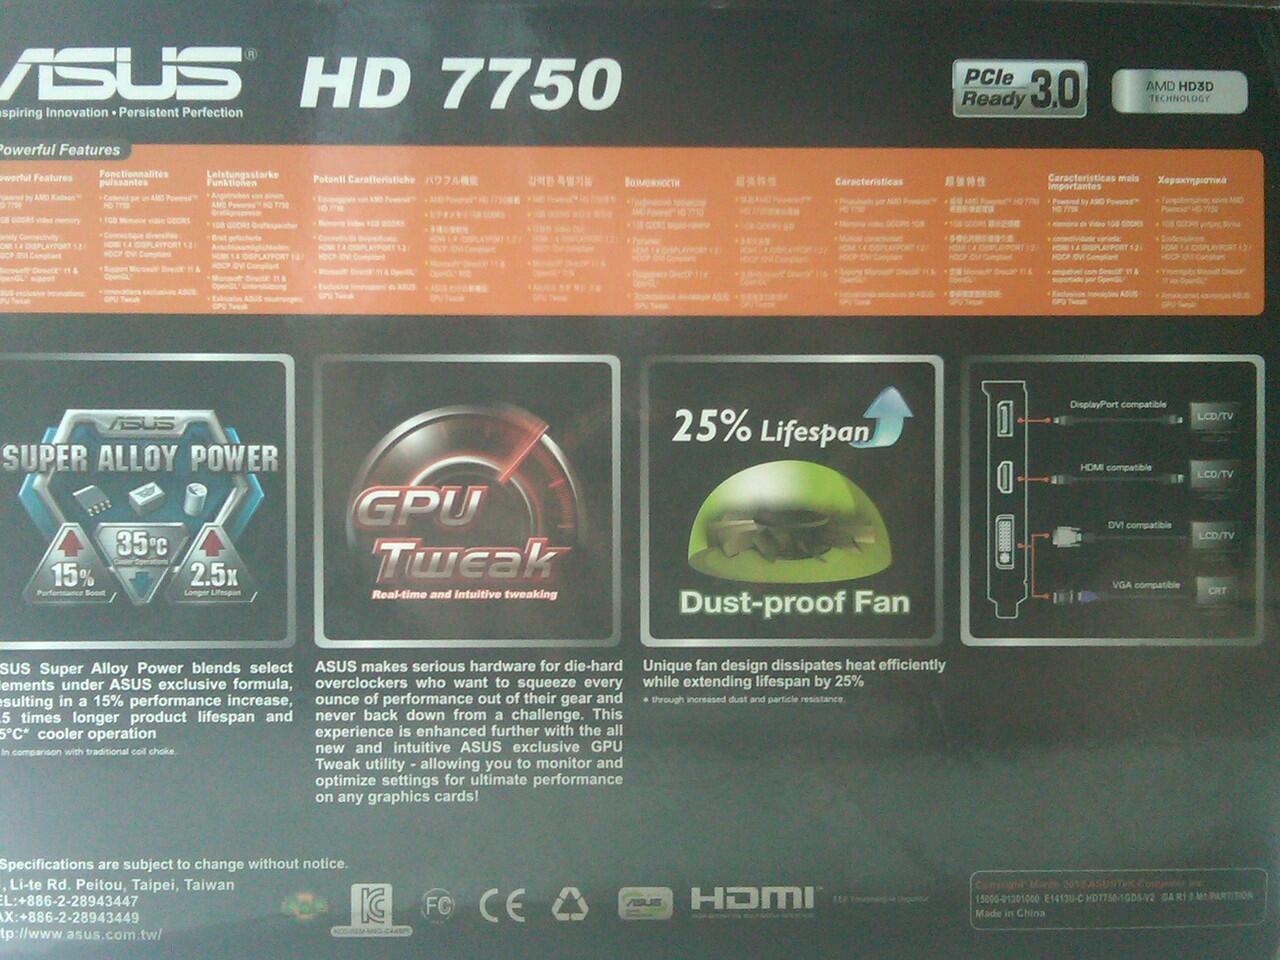 ASUS RADEON HD 7750-1GD5-V2